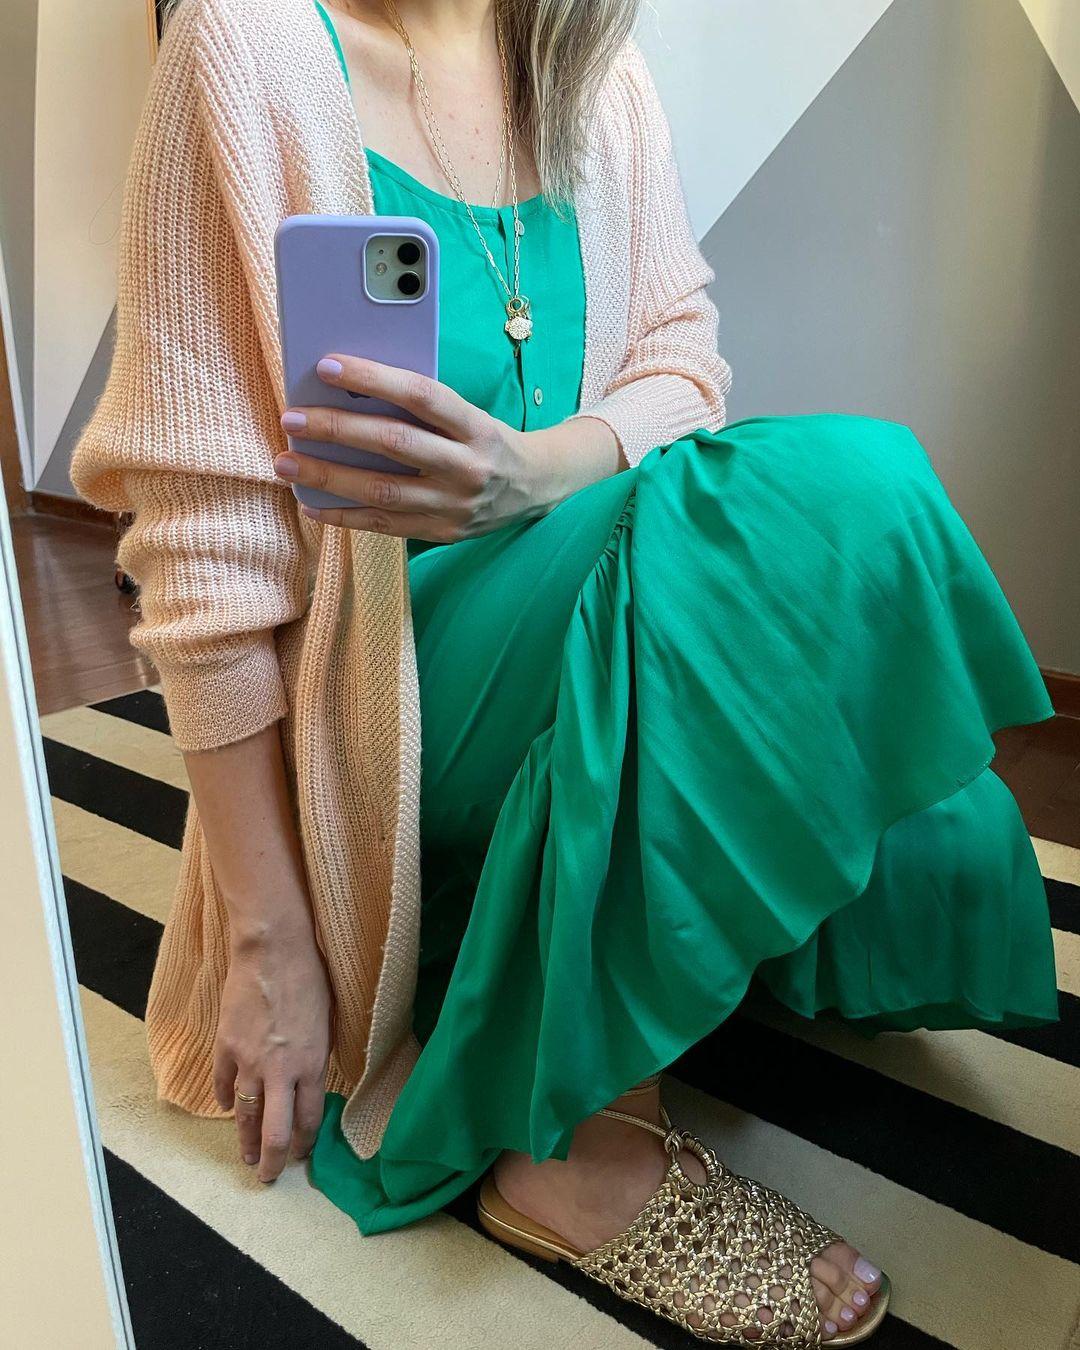 frio-calor-look-vestido-com-trico-sandalia-iara-leao-iaraleao-consultoria